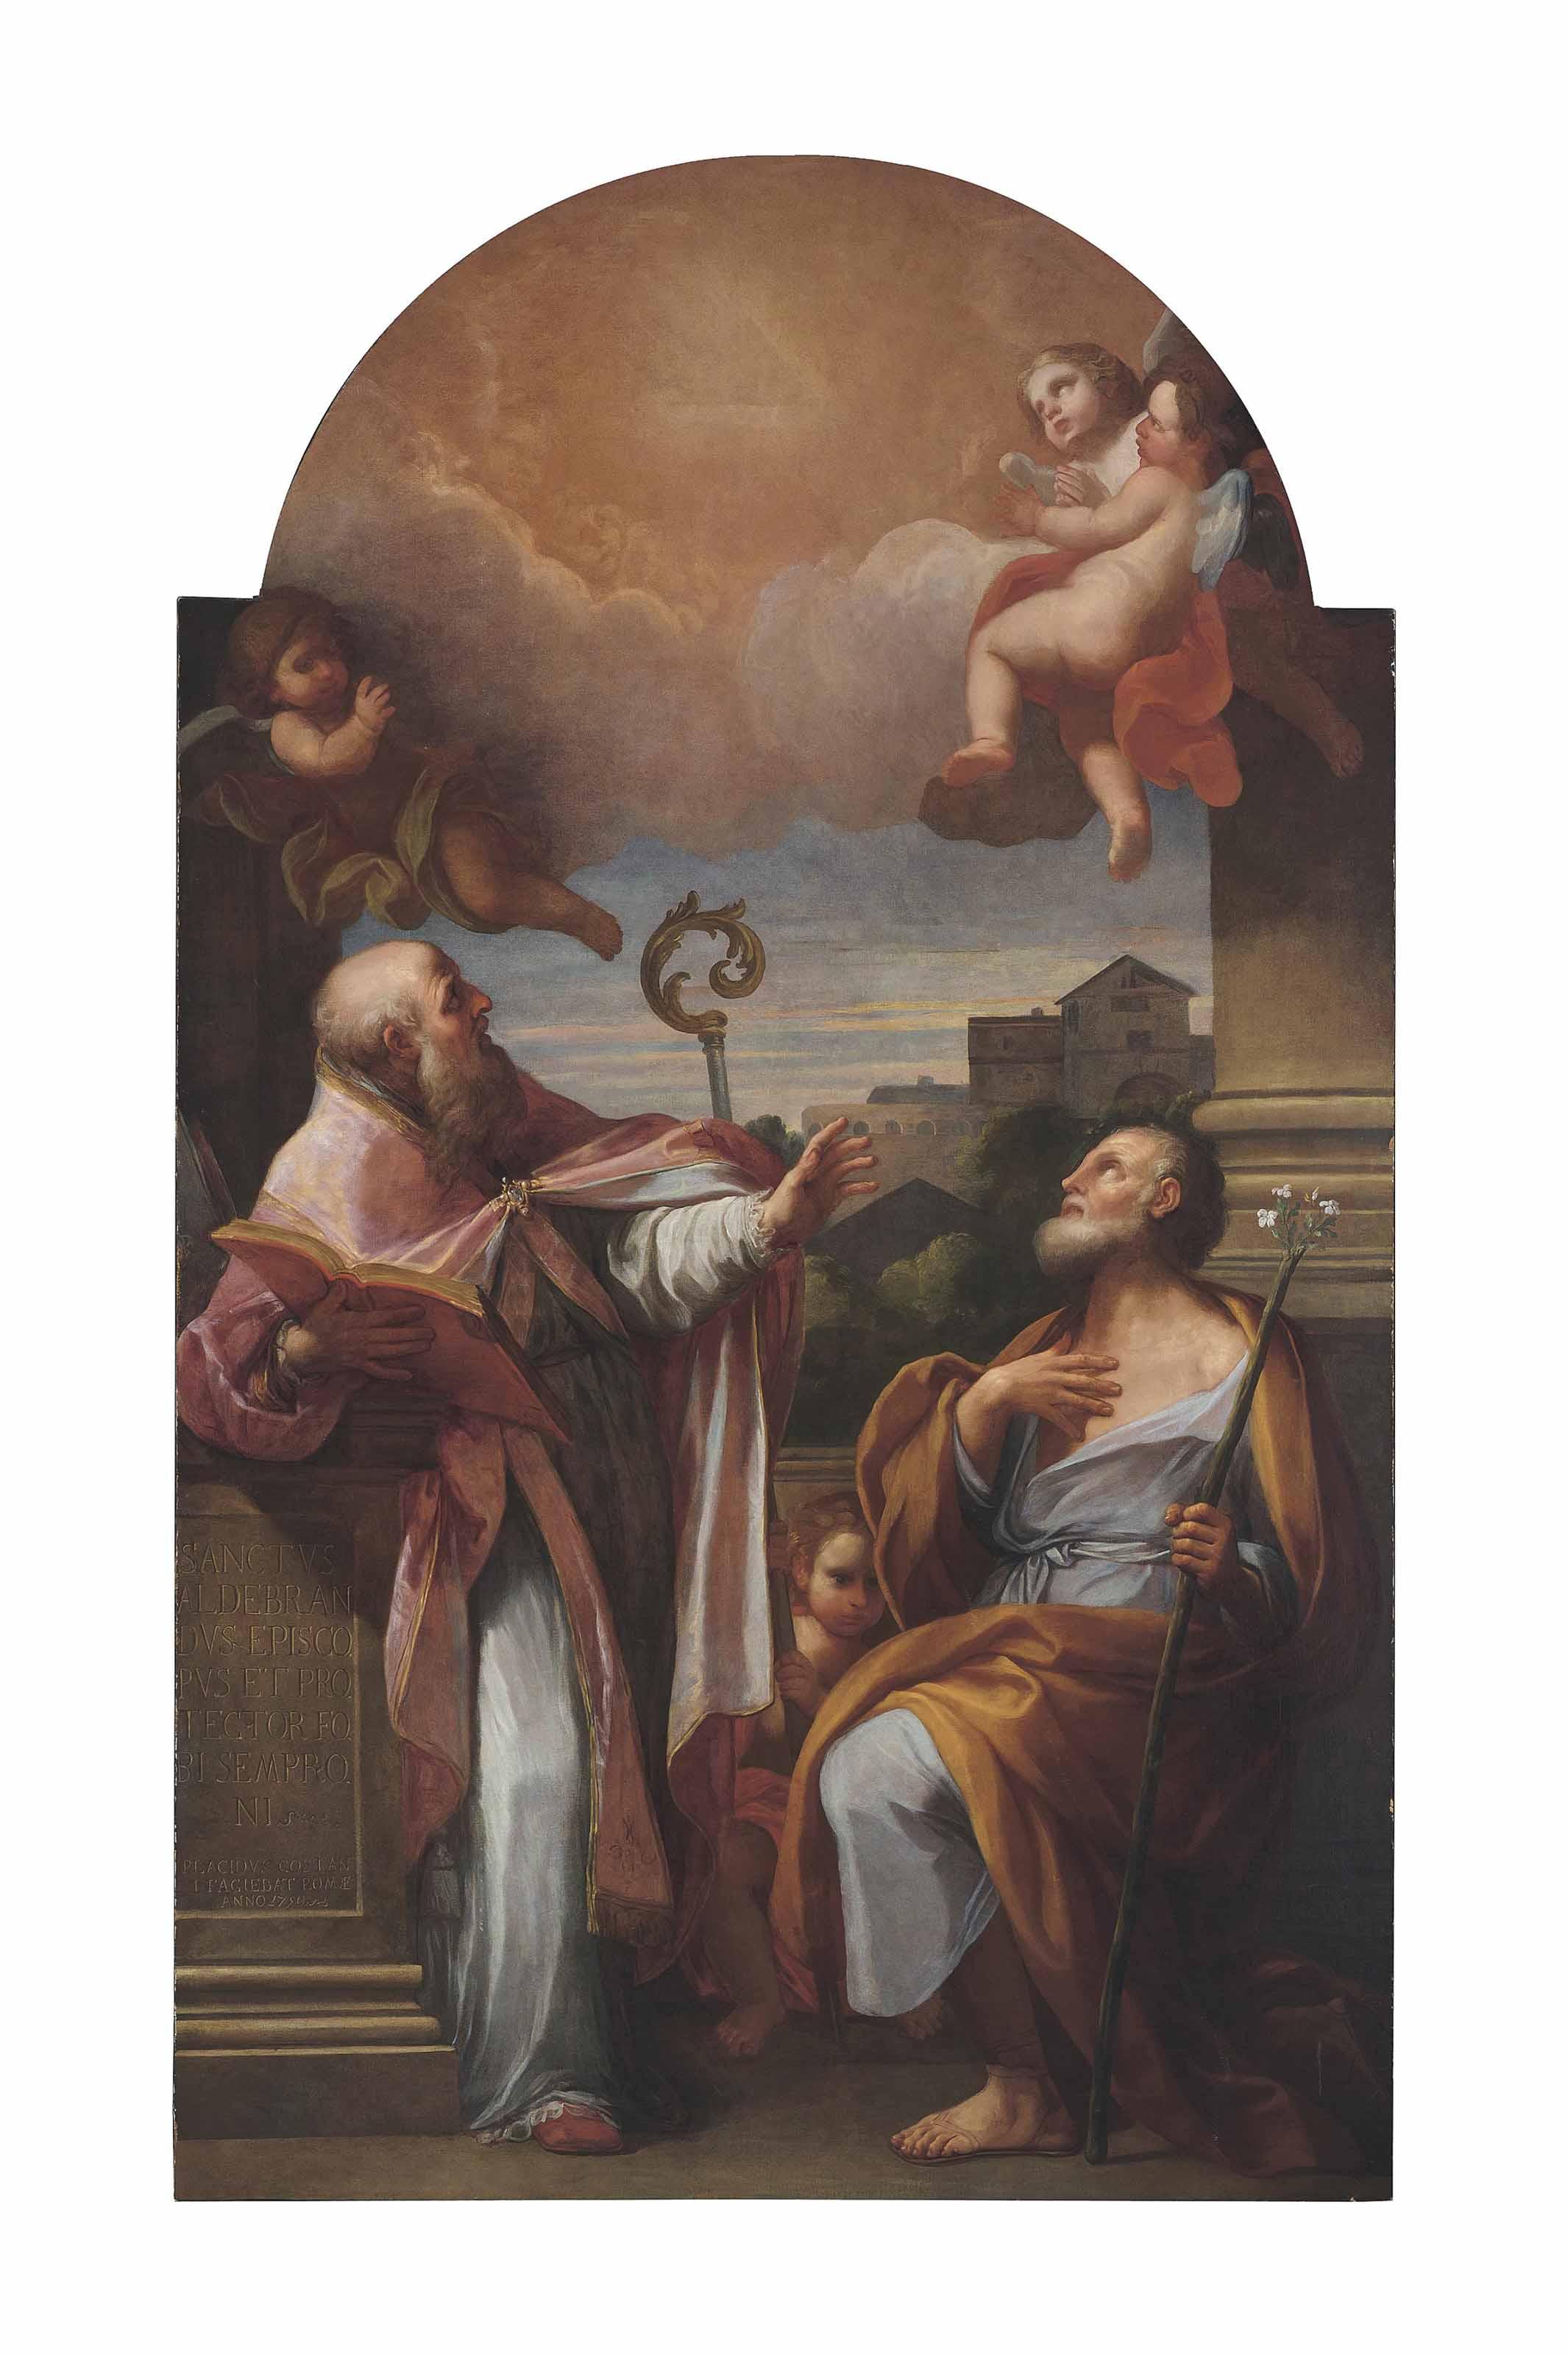 Saint Aldebrando of Fossembrone and Saint Joseph